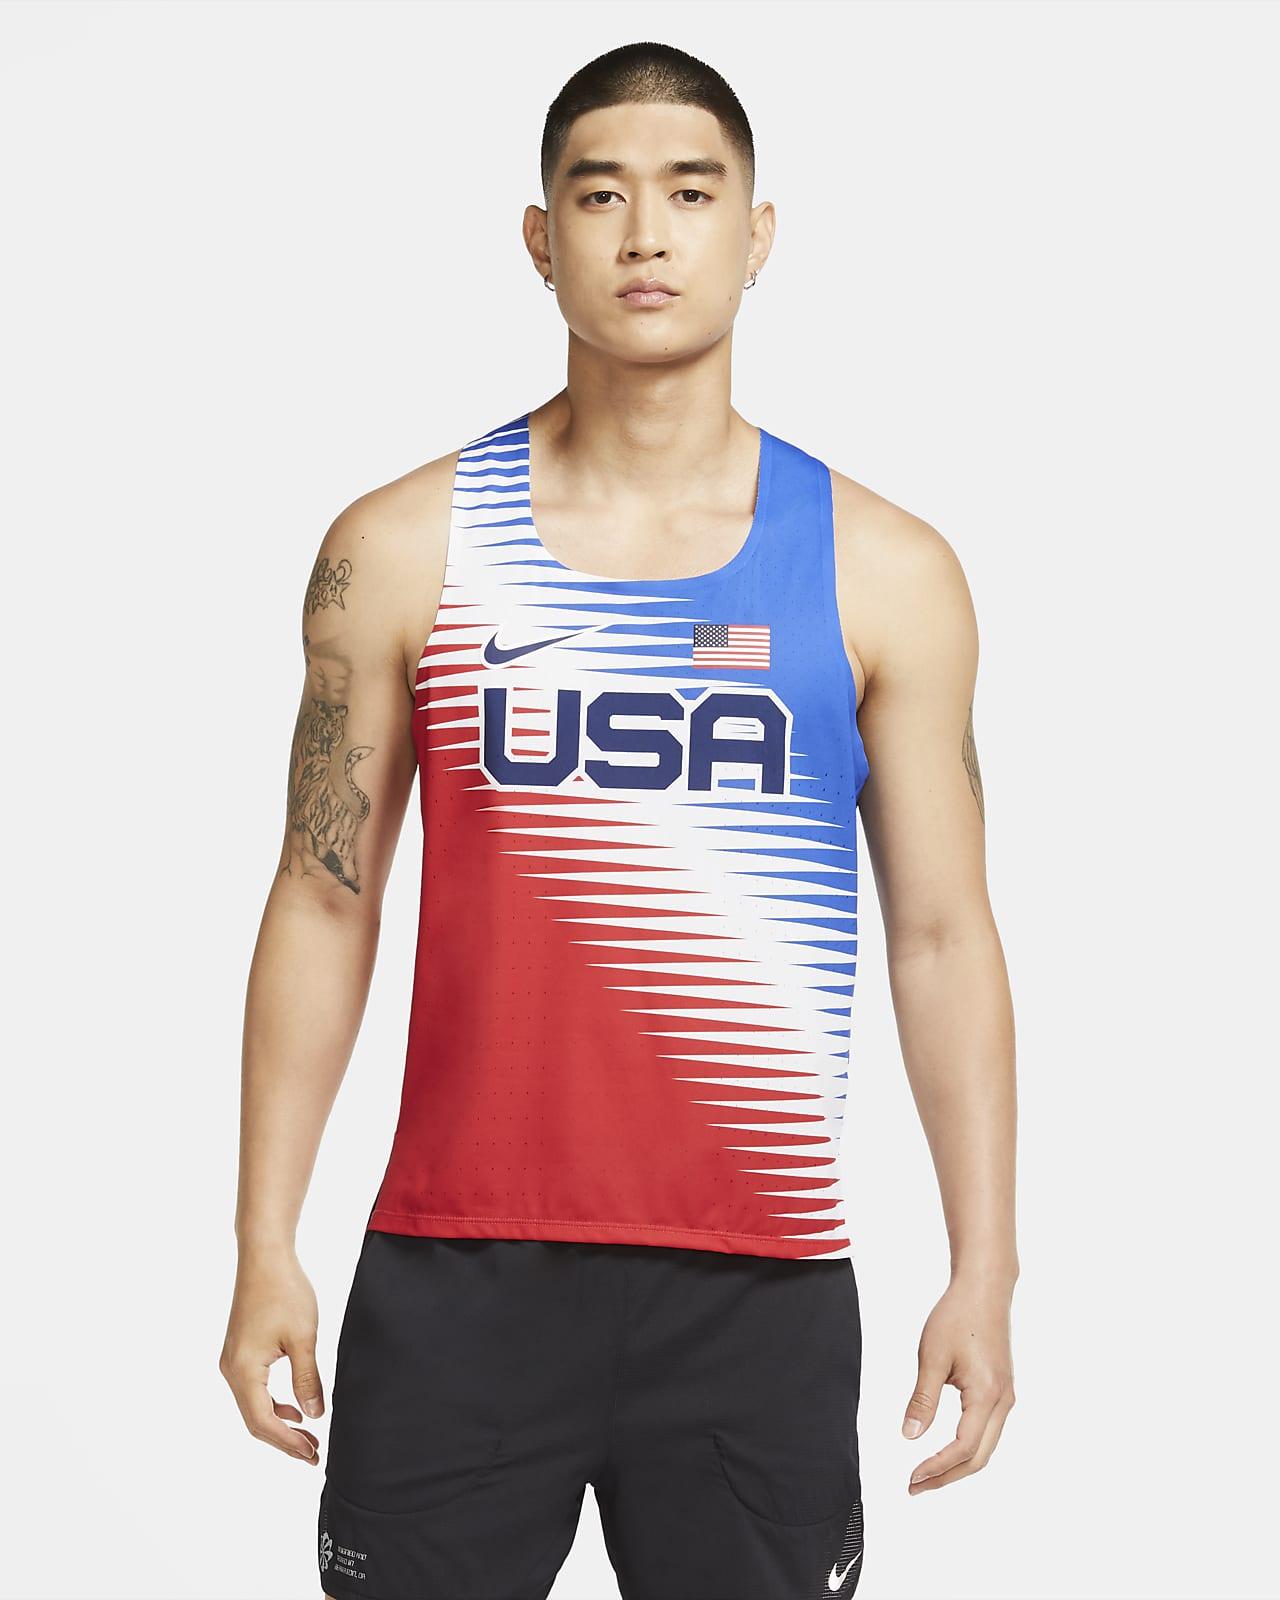 Nike Dri-FIT ADV Team USA AeroSwift Men's Running Singlet